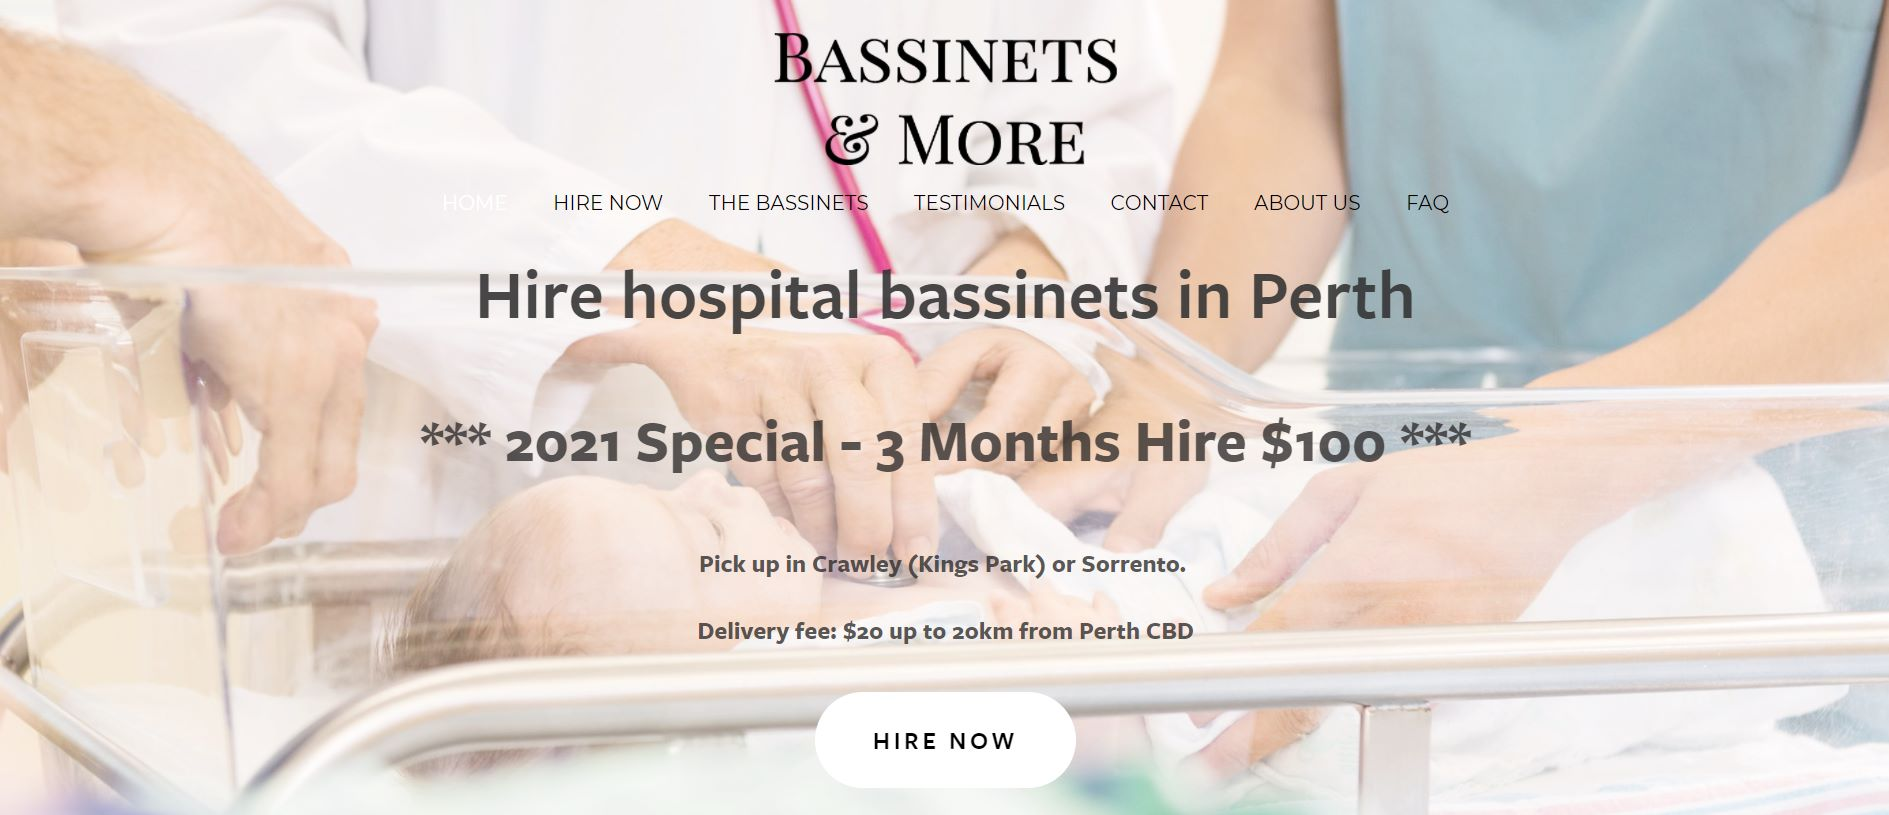 bassinets & more perth